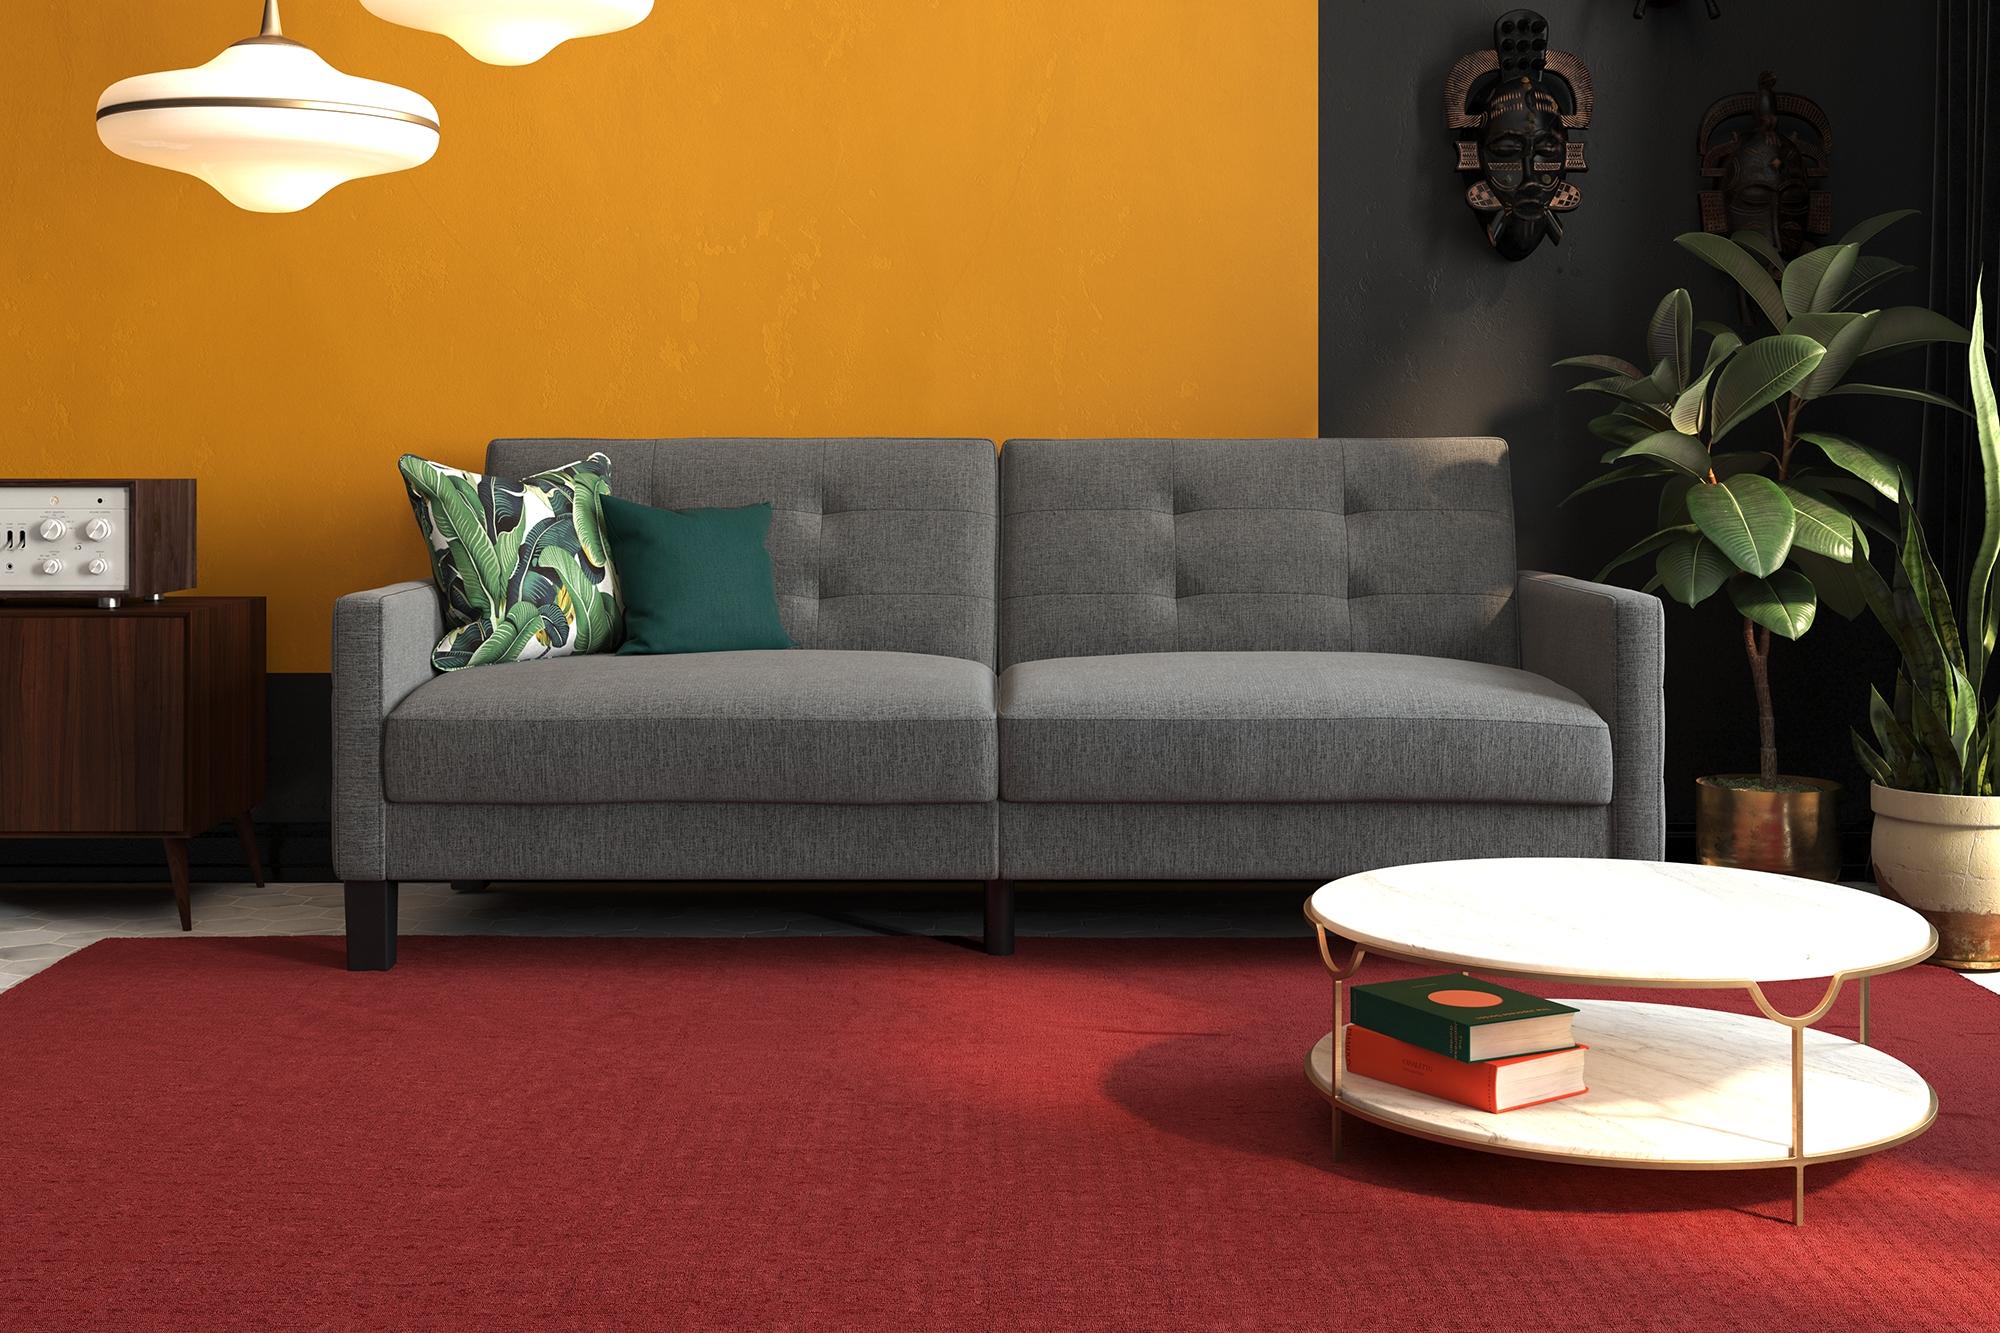 Astonishing Sherpard Futon Gray Products Furniture Nebraska Theyellowbook Wood Chair Design Ideas Theyellowbookinfo